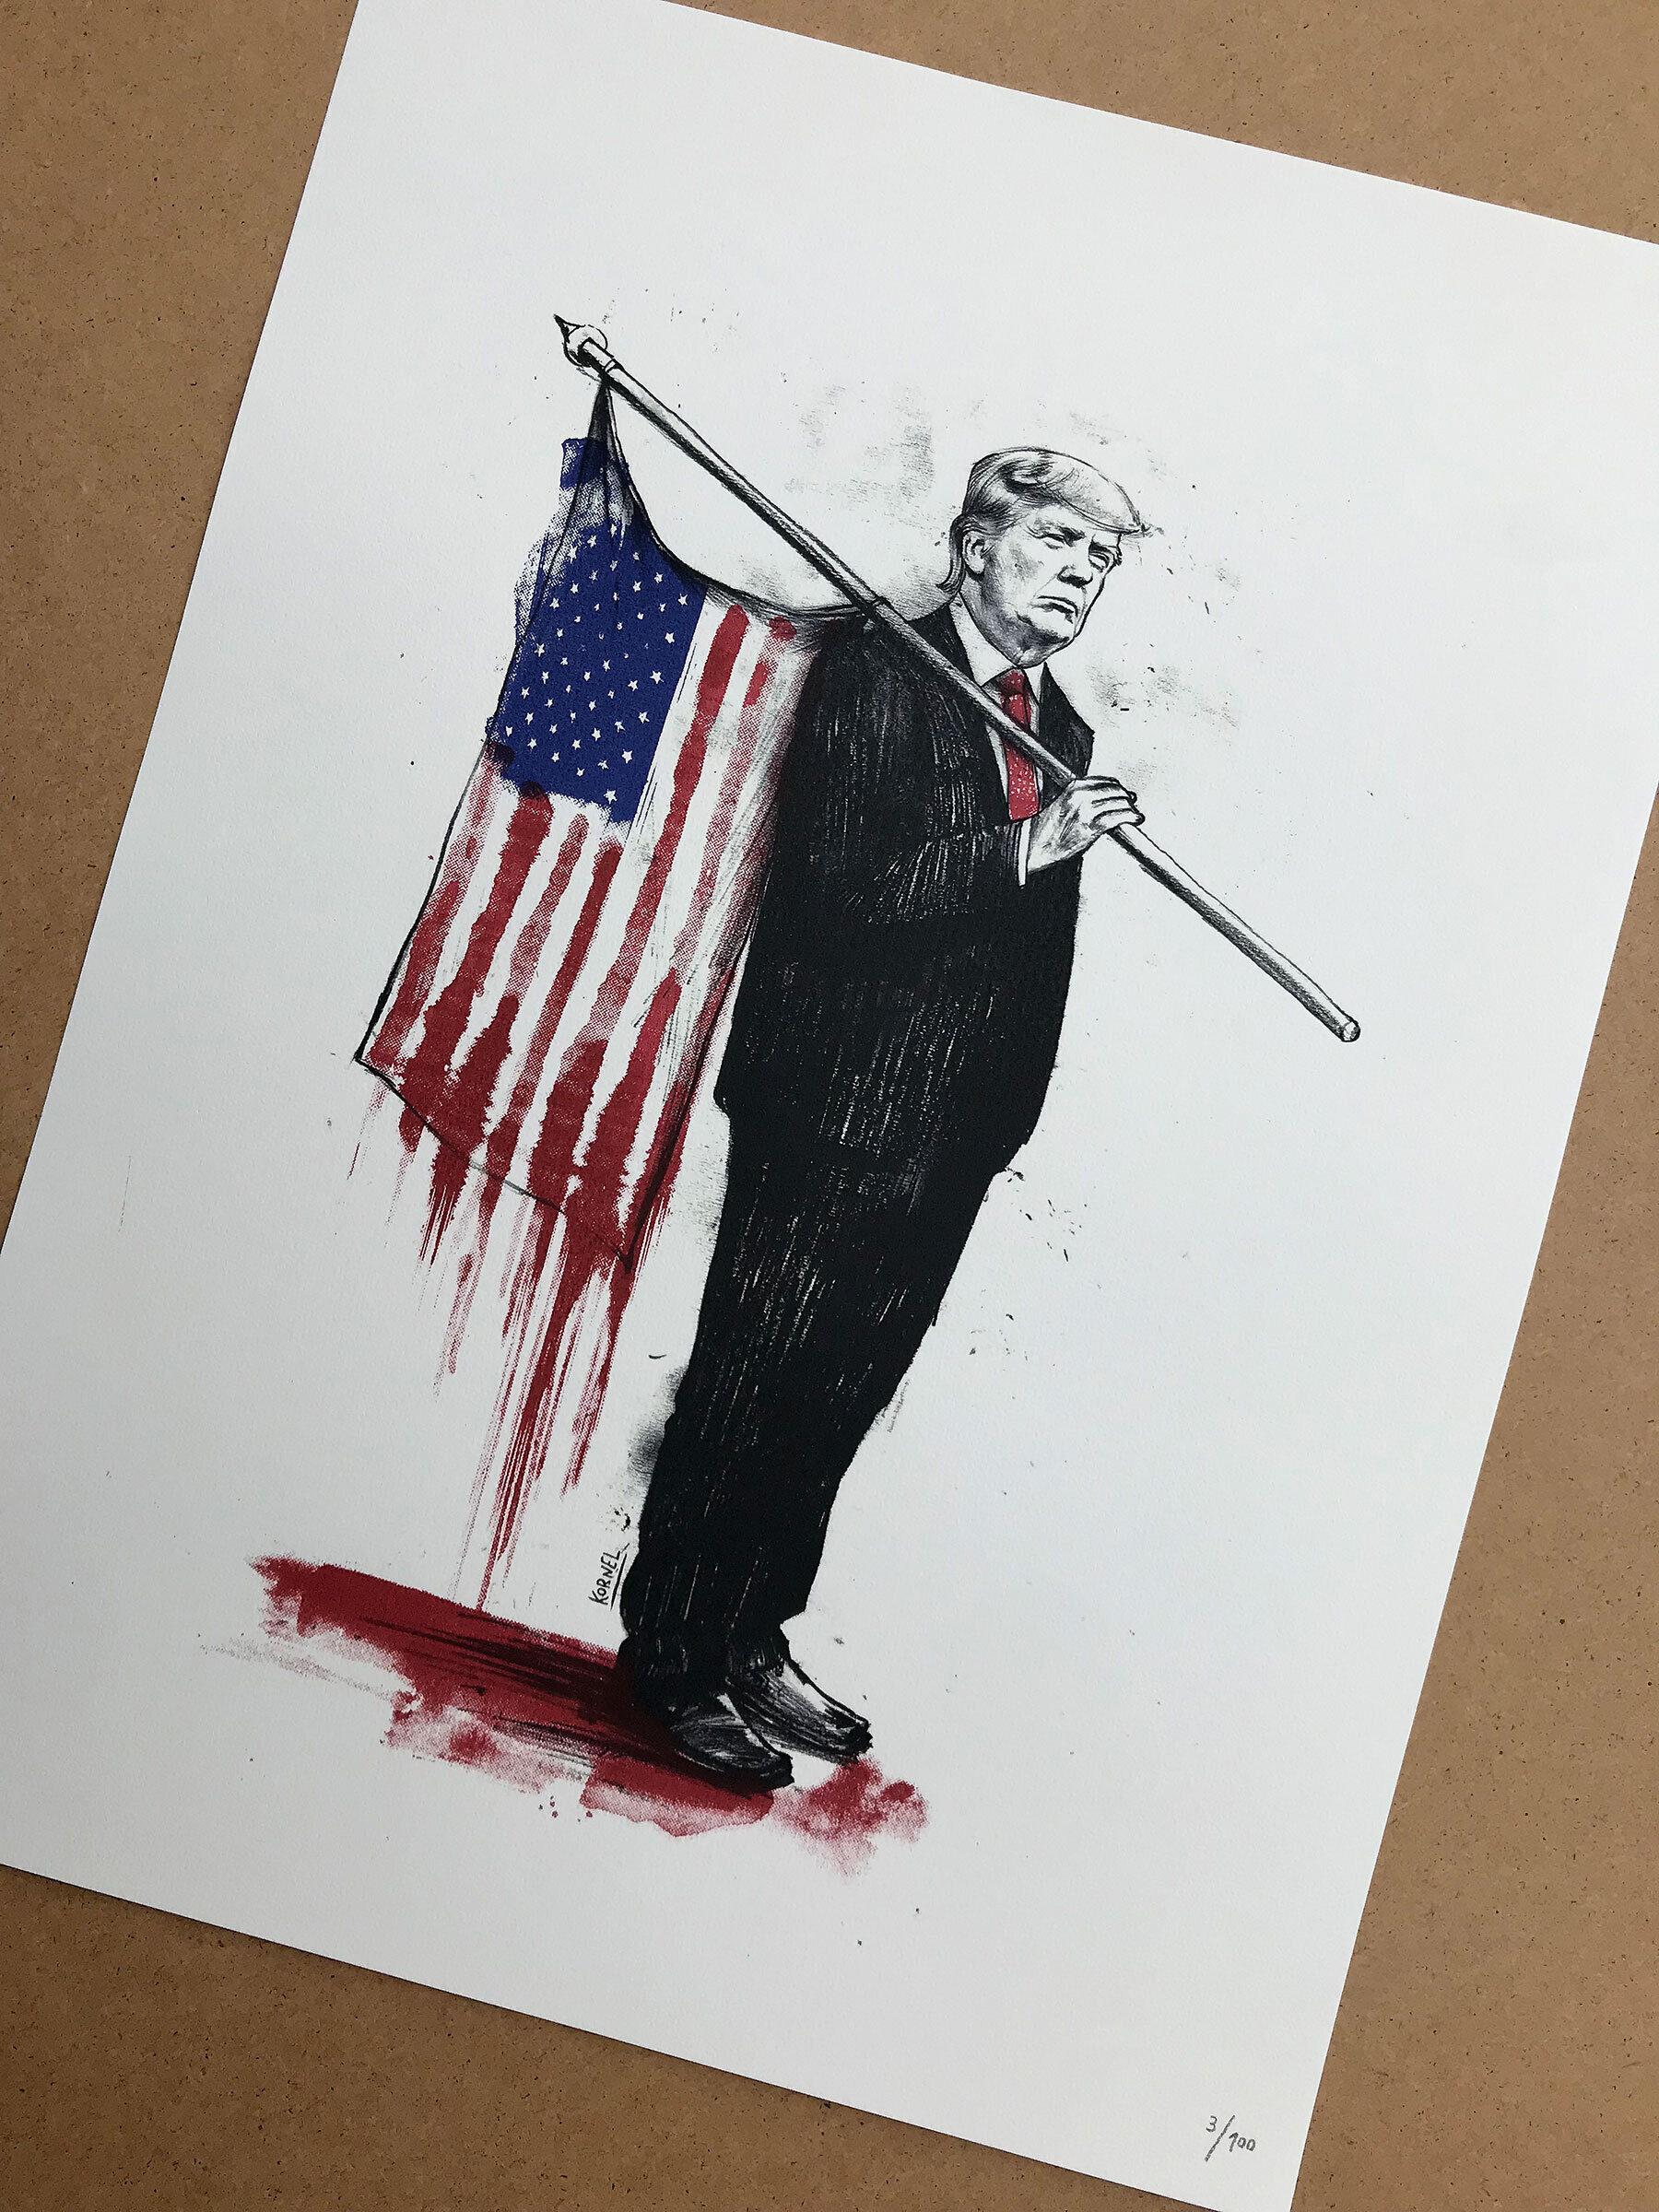 Donald Trump Artwork Bloodymerica - Kornel Illustration | Kornel Stadler portfolio